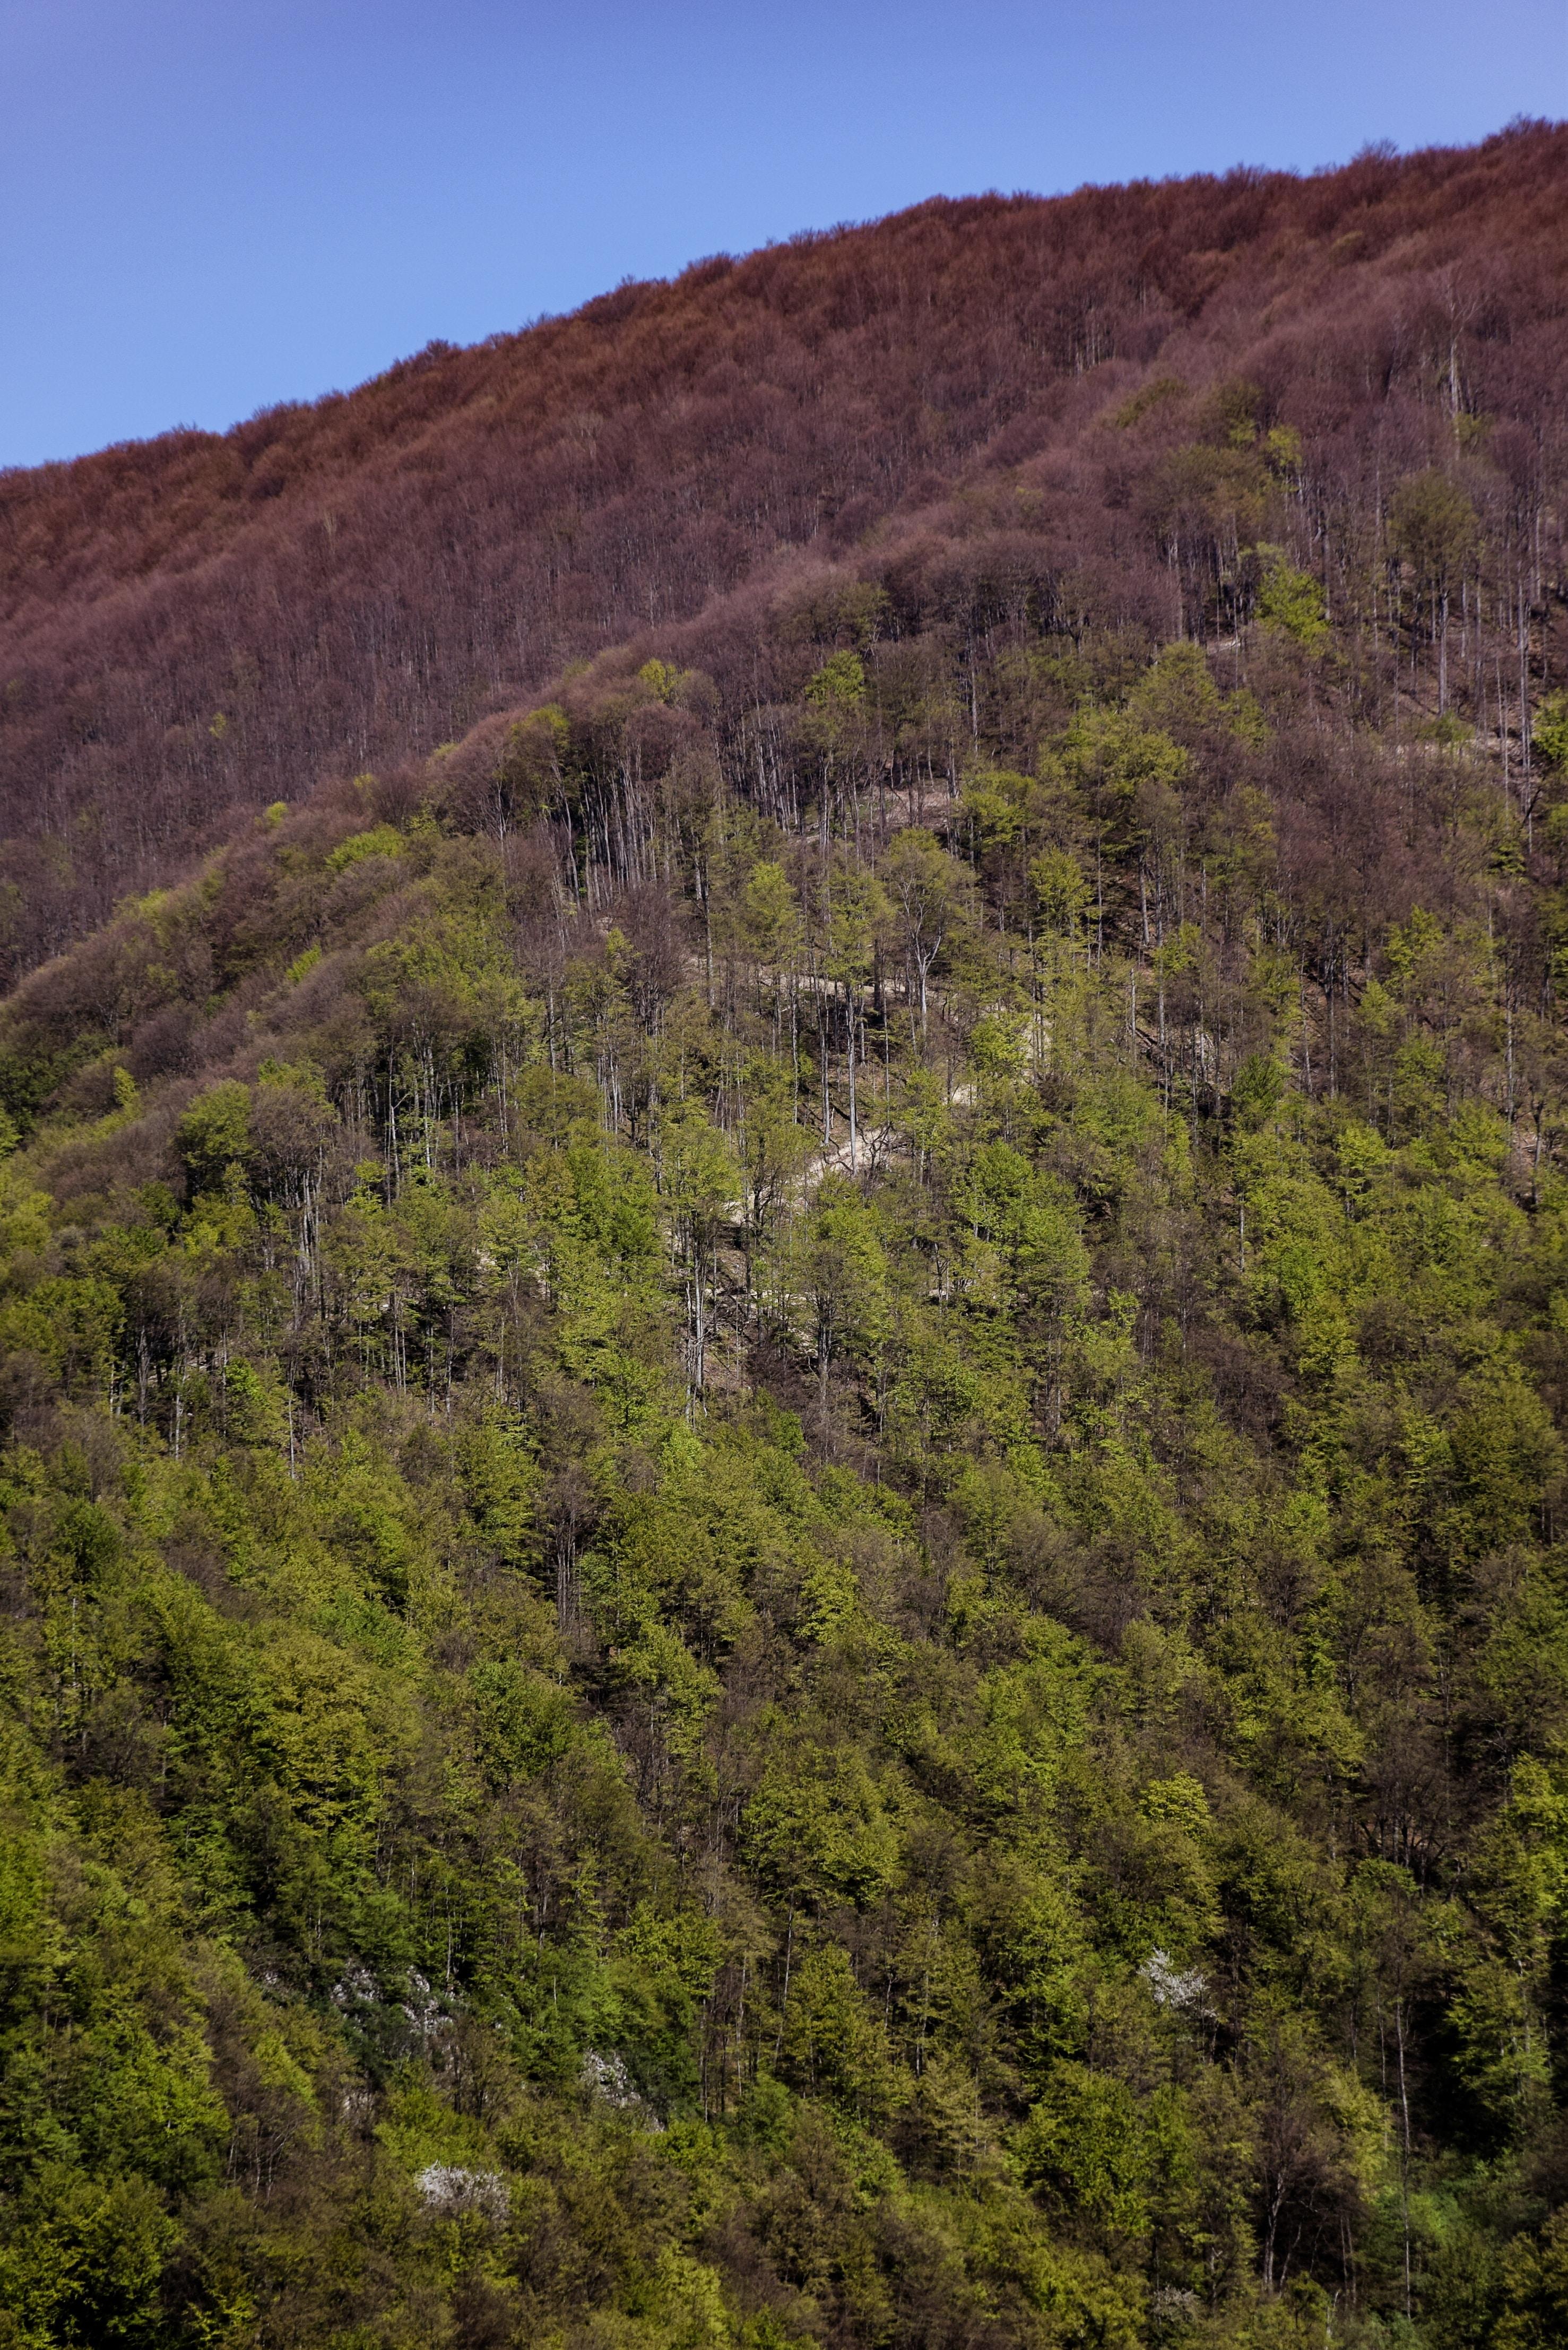 green trees near brown trees